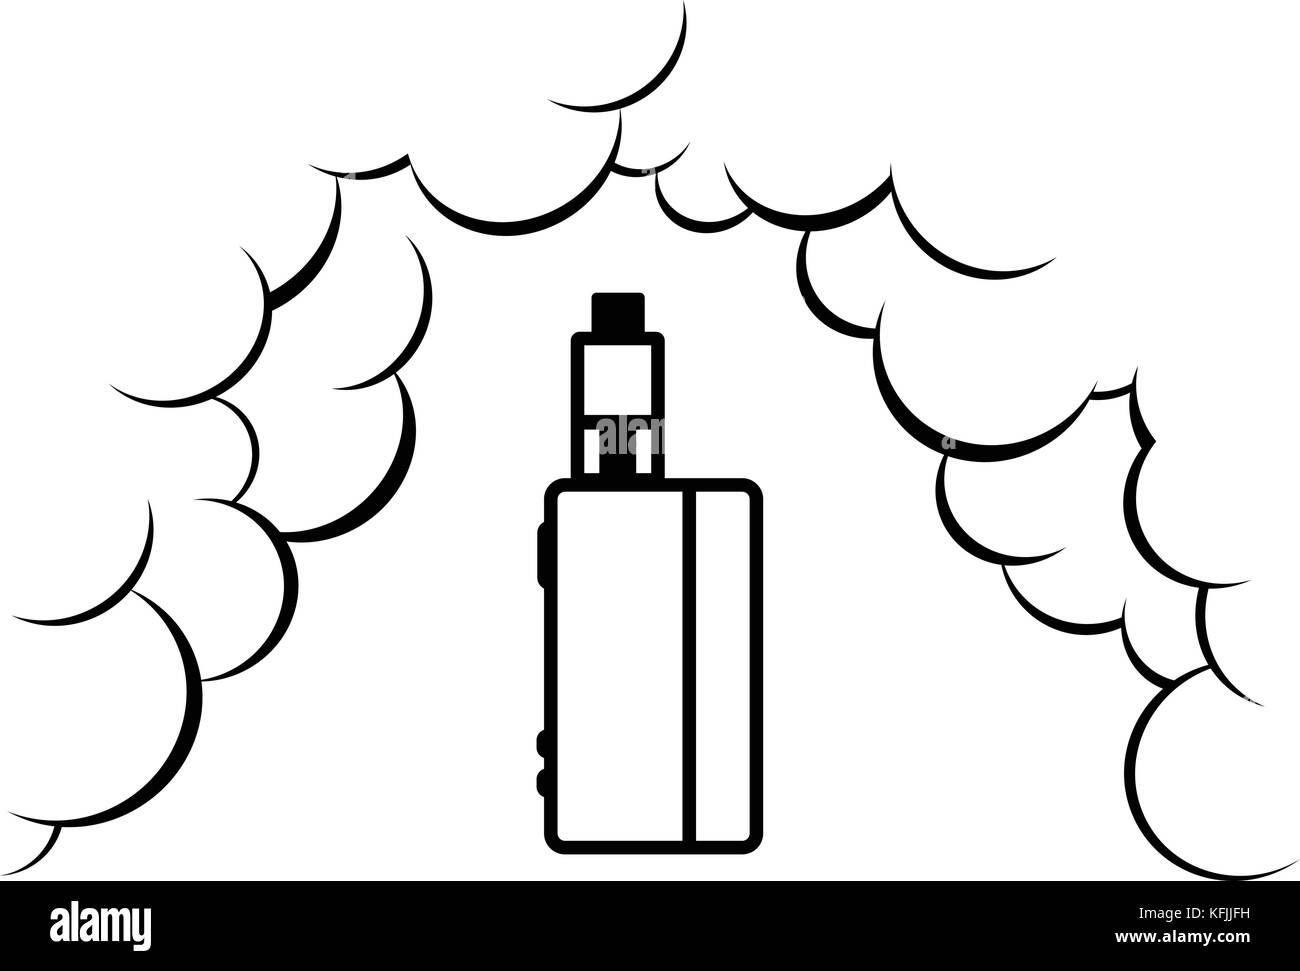 vaporizer electric cigarette vapor mod - vape life vector Stock Vector